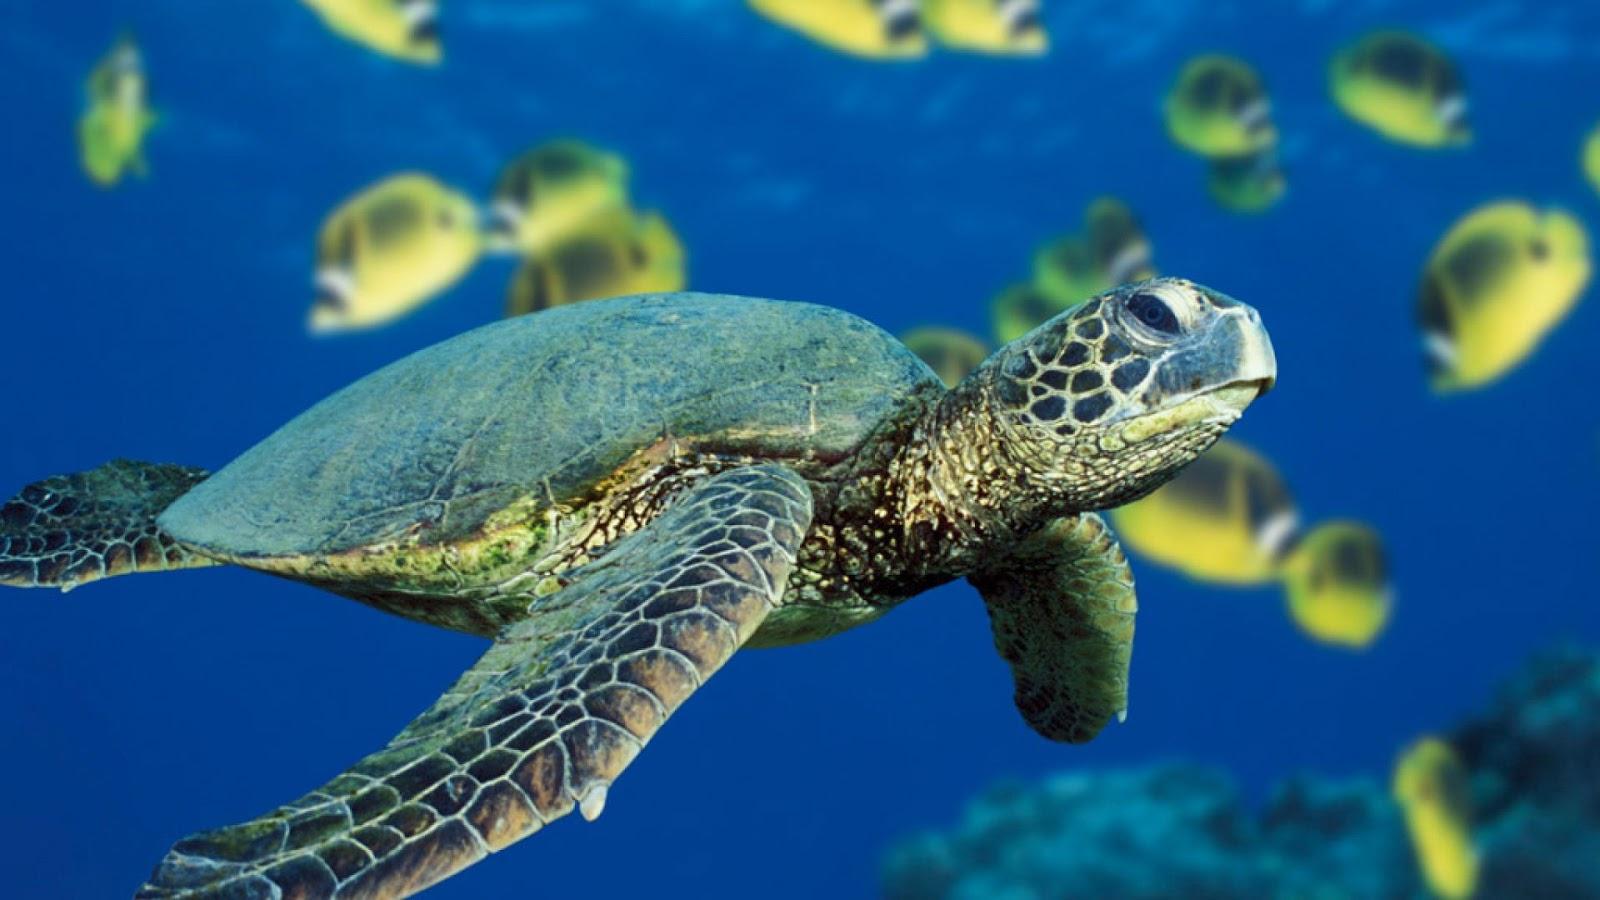 http://1.bp.blogspot.com/-s6et02PeCwo/UHa7BgsDbrI/AAAAAAAAGl8/2sjEKeU-lkw/s1600/Sea_Turtle_Wallpaper_2.jpg